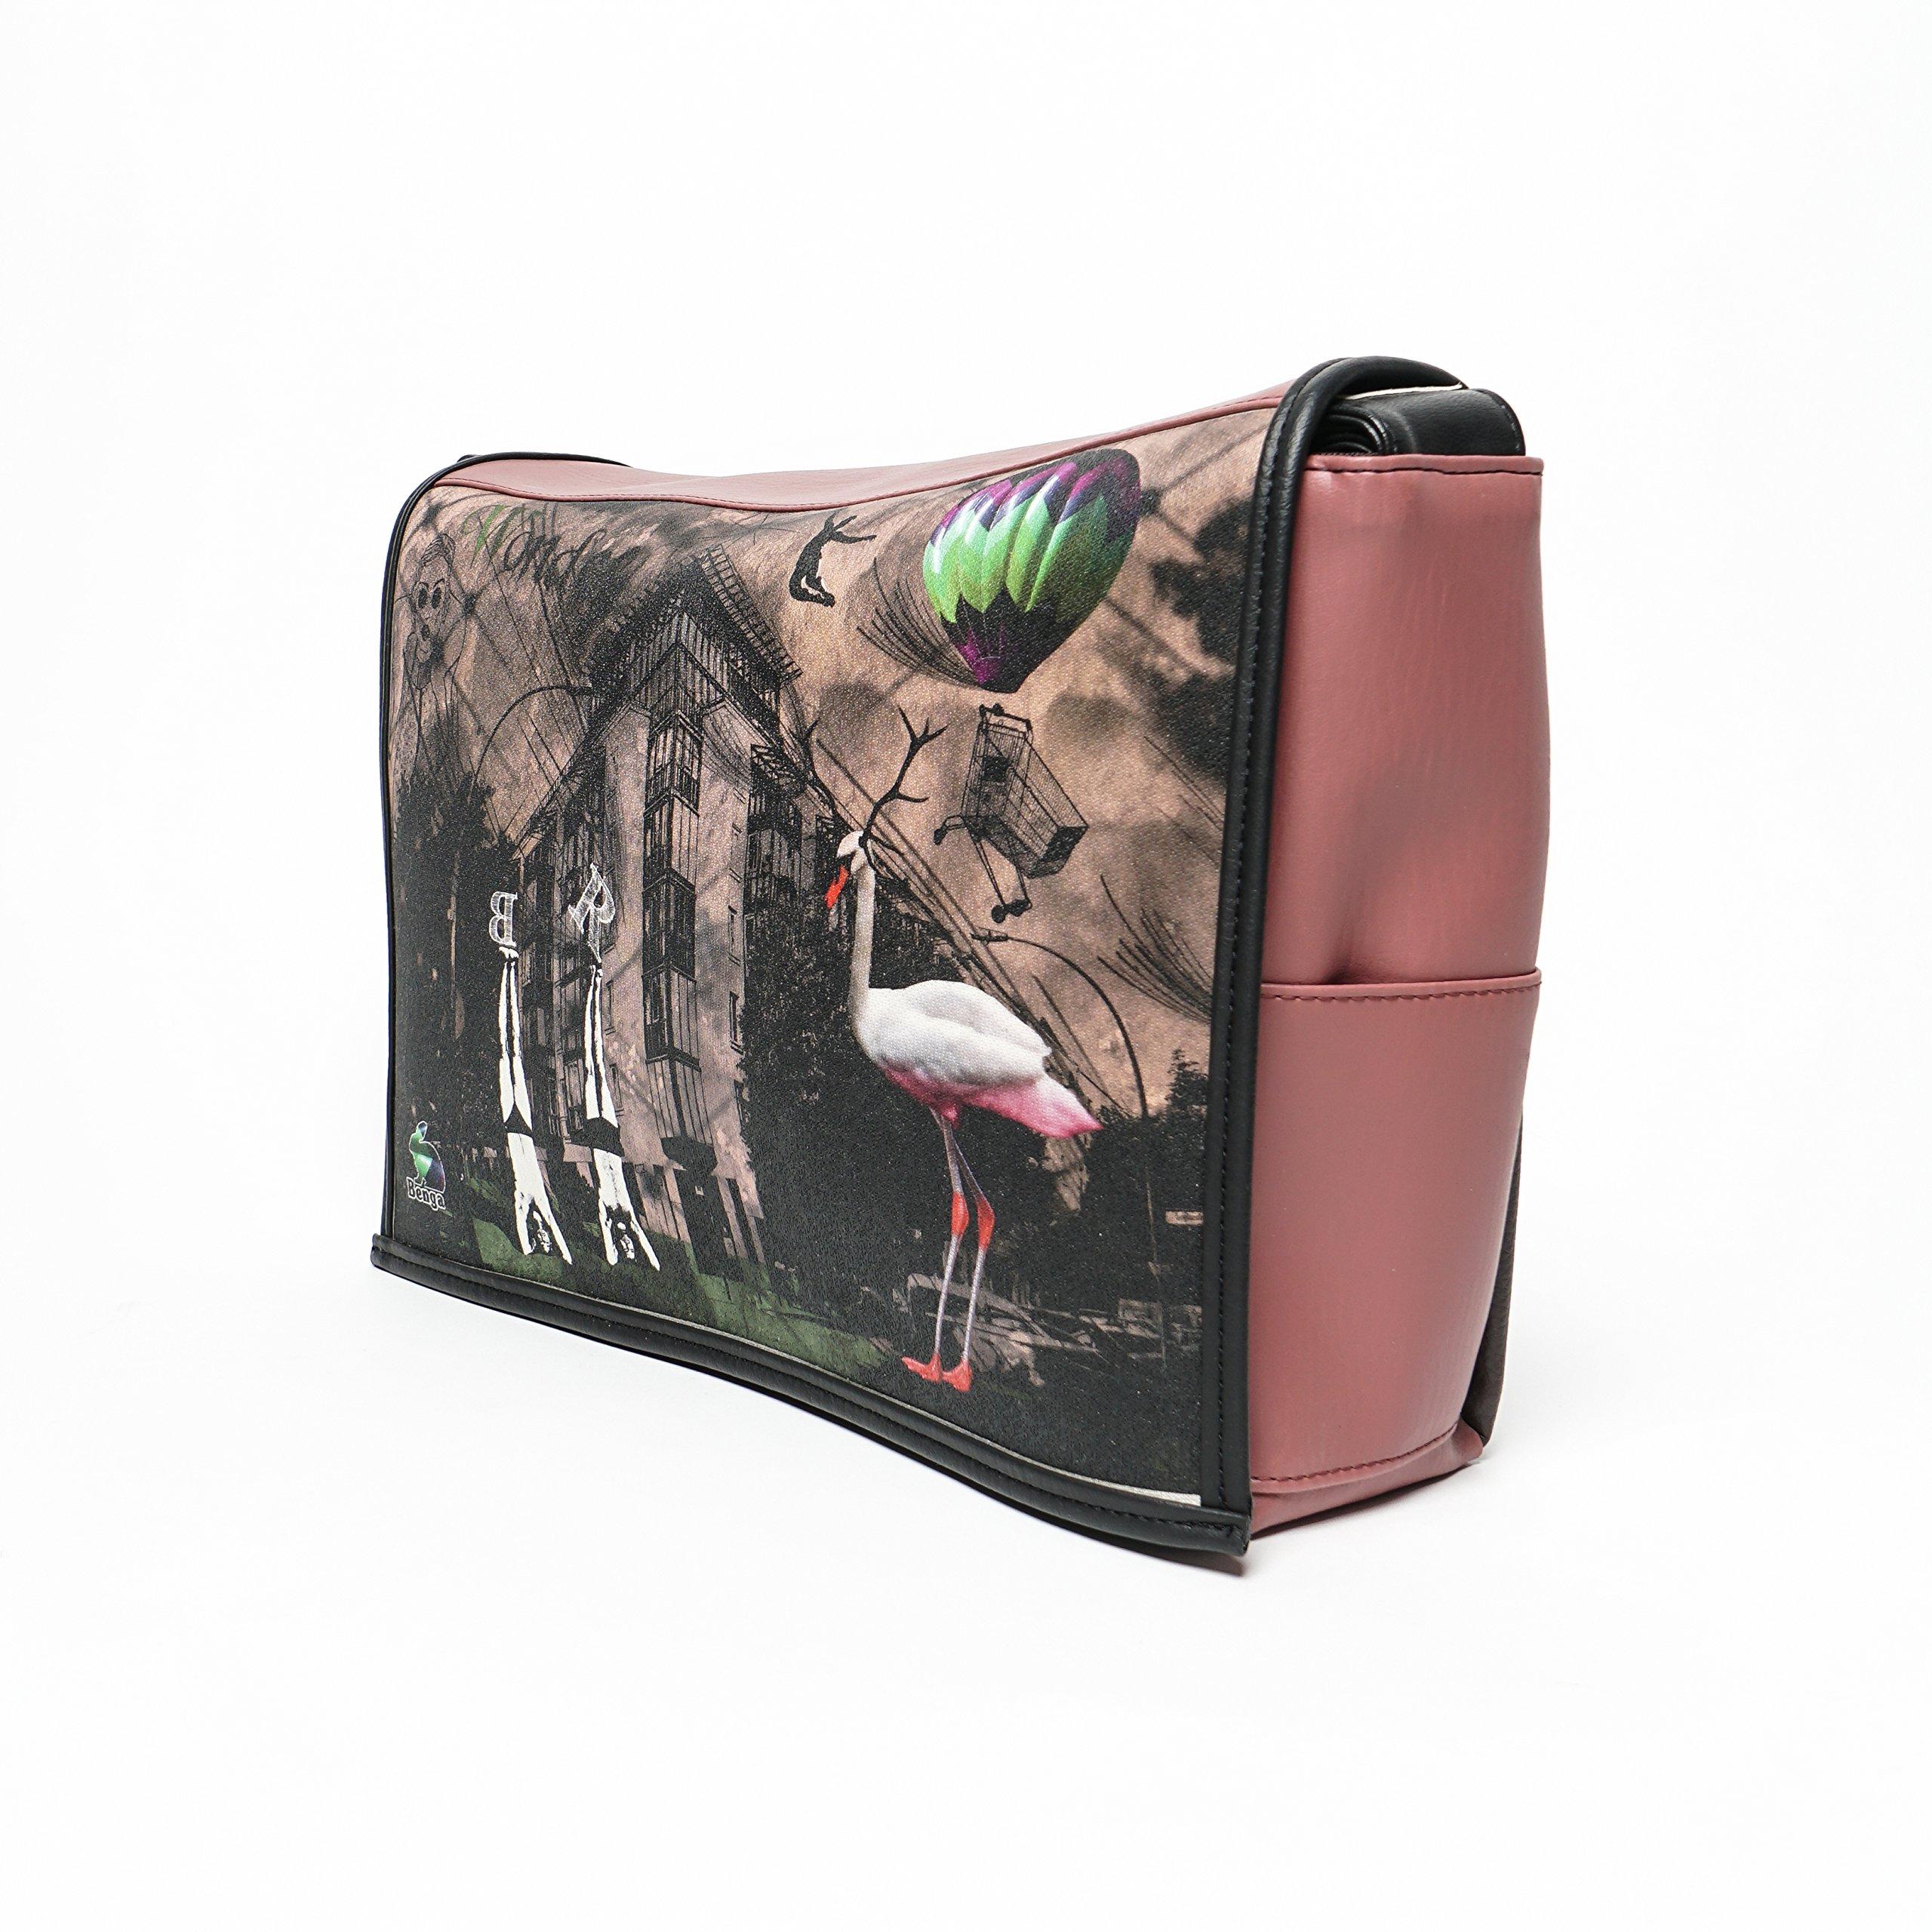 Student - Wonder Pink Print - Benga Rabbit - Brown Vegan Leather Messenger Bag